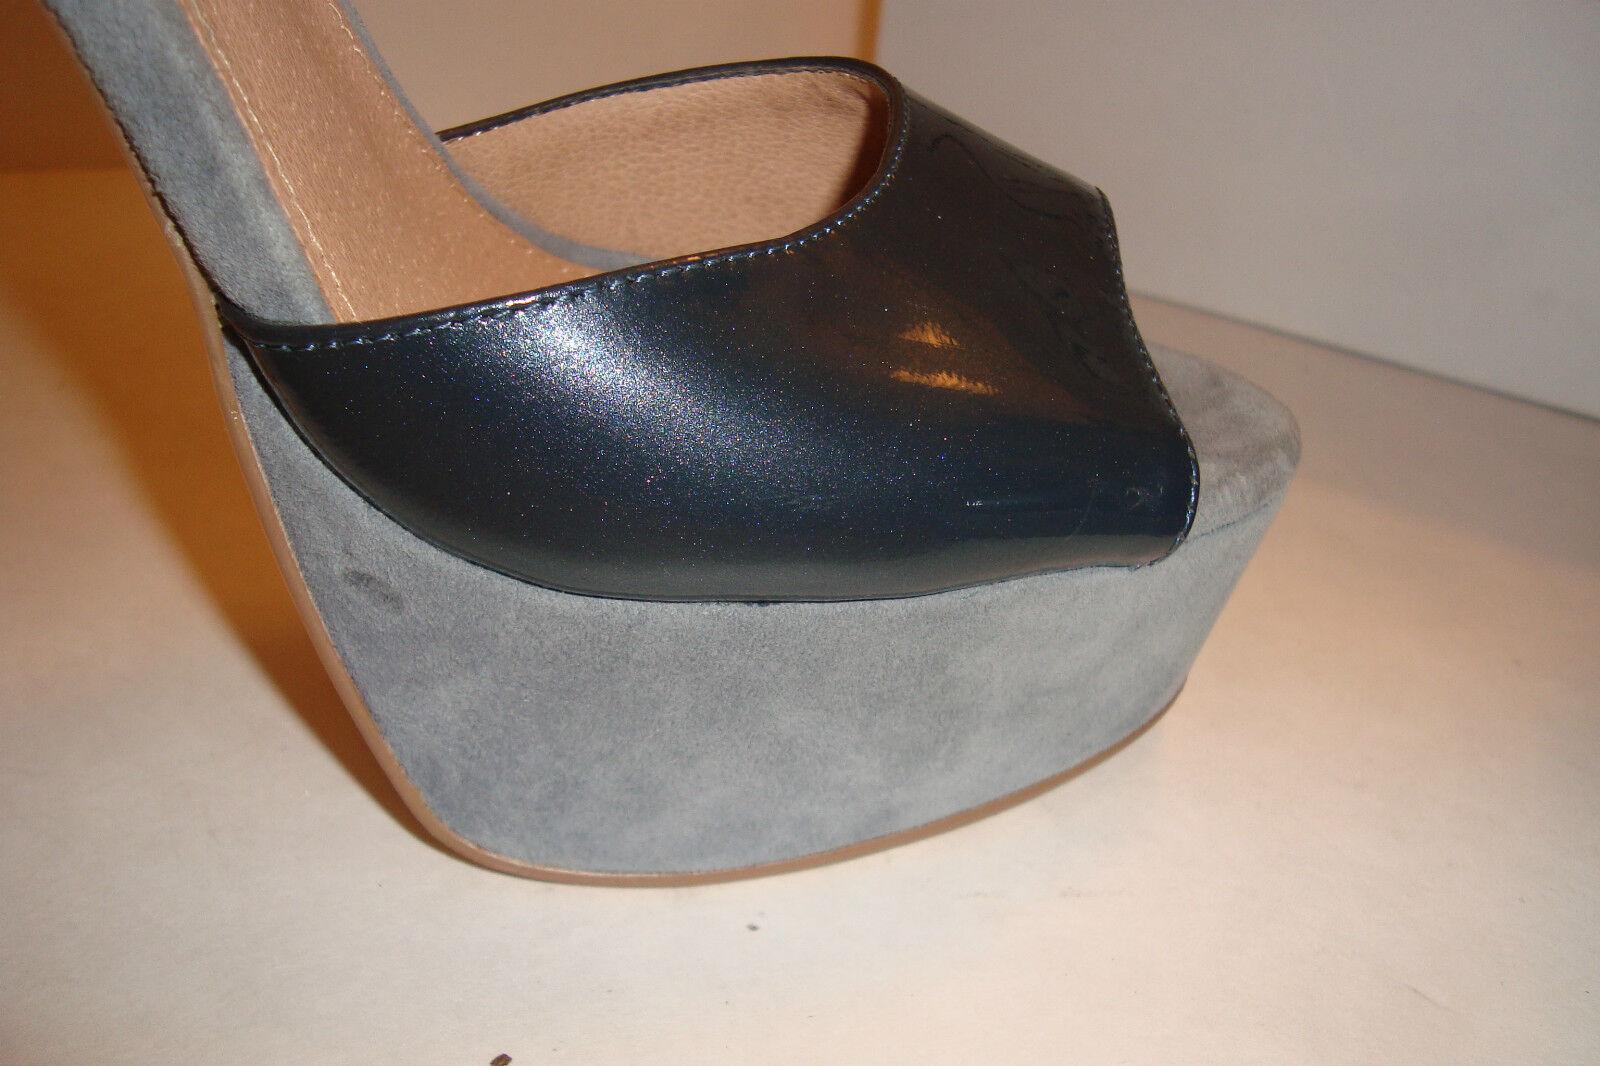 Steve Madden Damenschuhe Dynemite Schuhes Blau Multi Ankle Sandales Schuhes Dynemite 9 MED DISPLAY a52a35